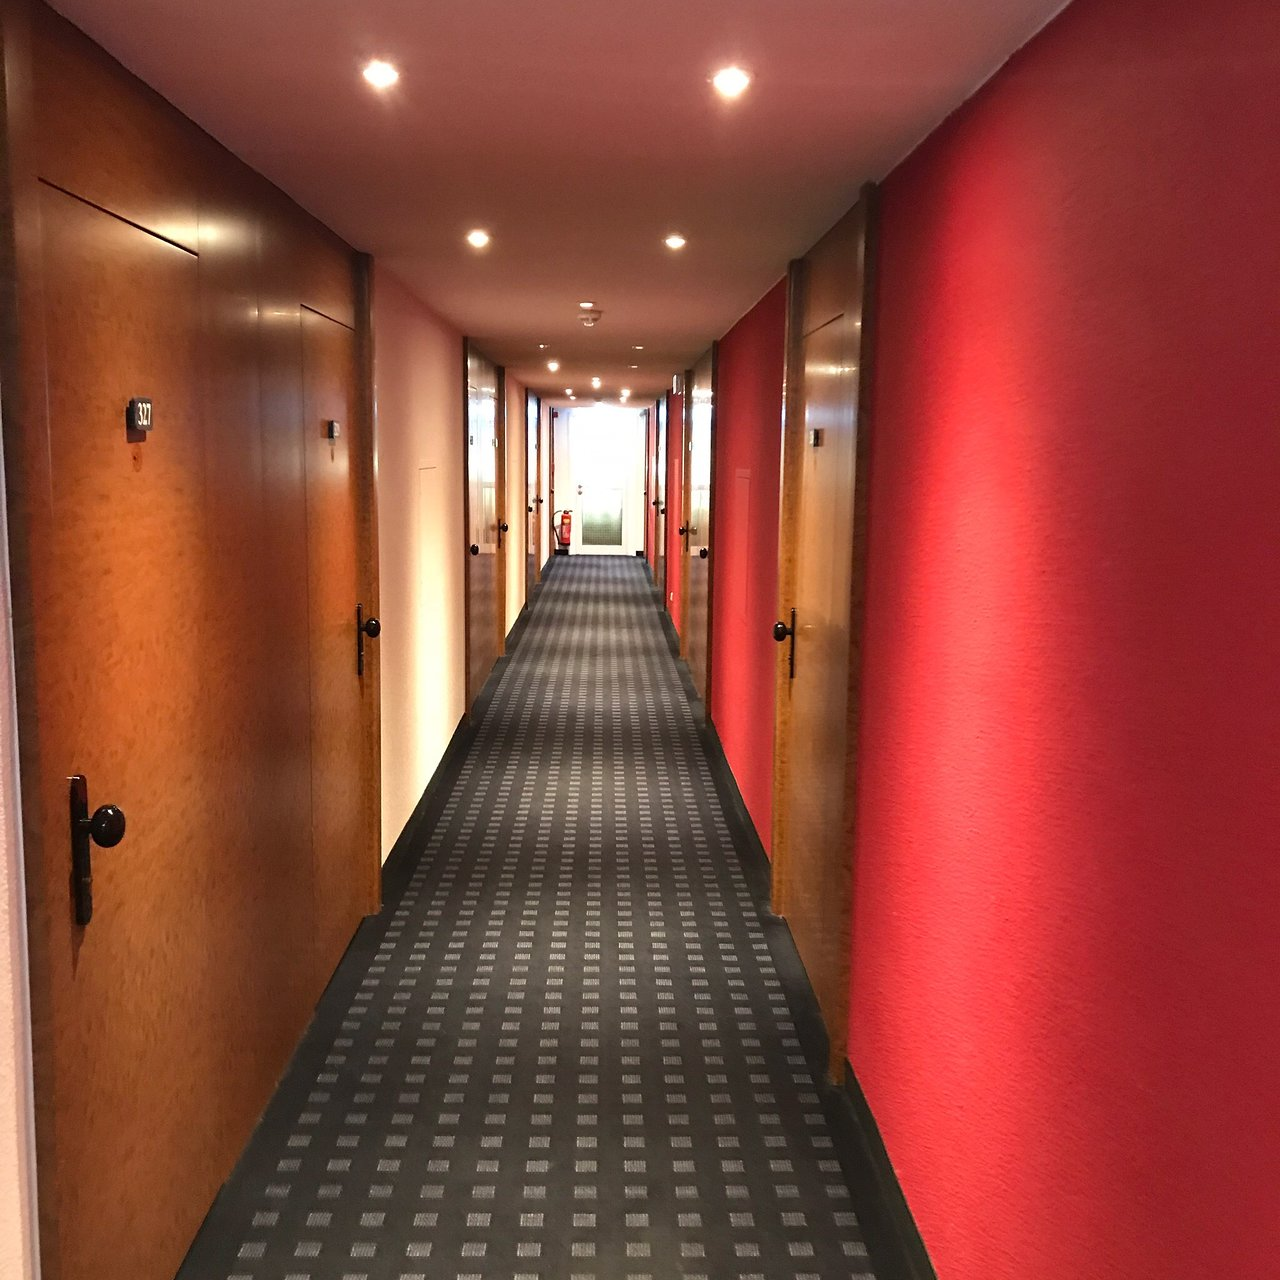 langlebig im einsatz große Auswahl ankommen ARA HOTEL - INGOLSTADT $93 ($̶1̶1̶3̶) - Prices & Reviews ...